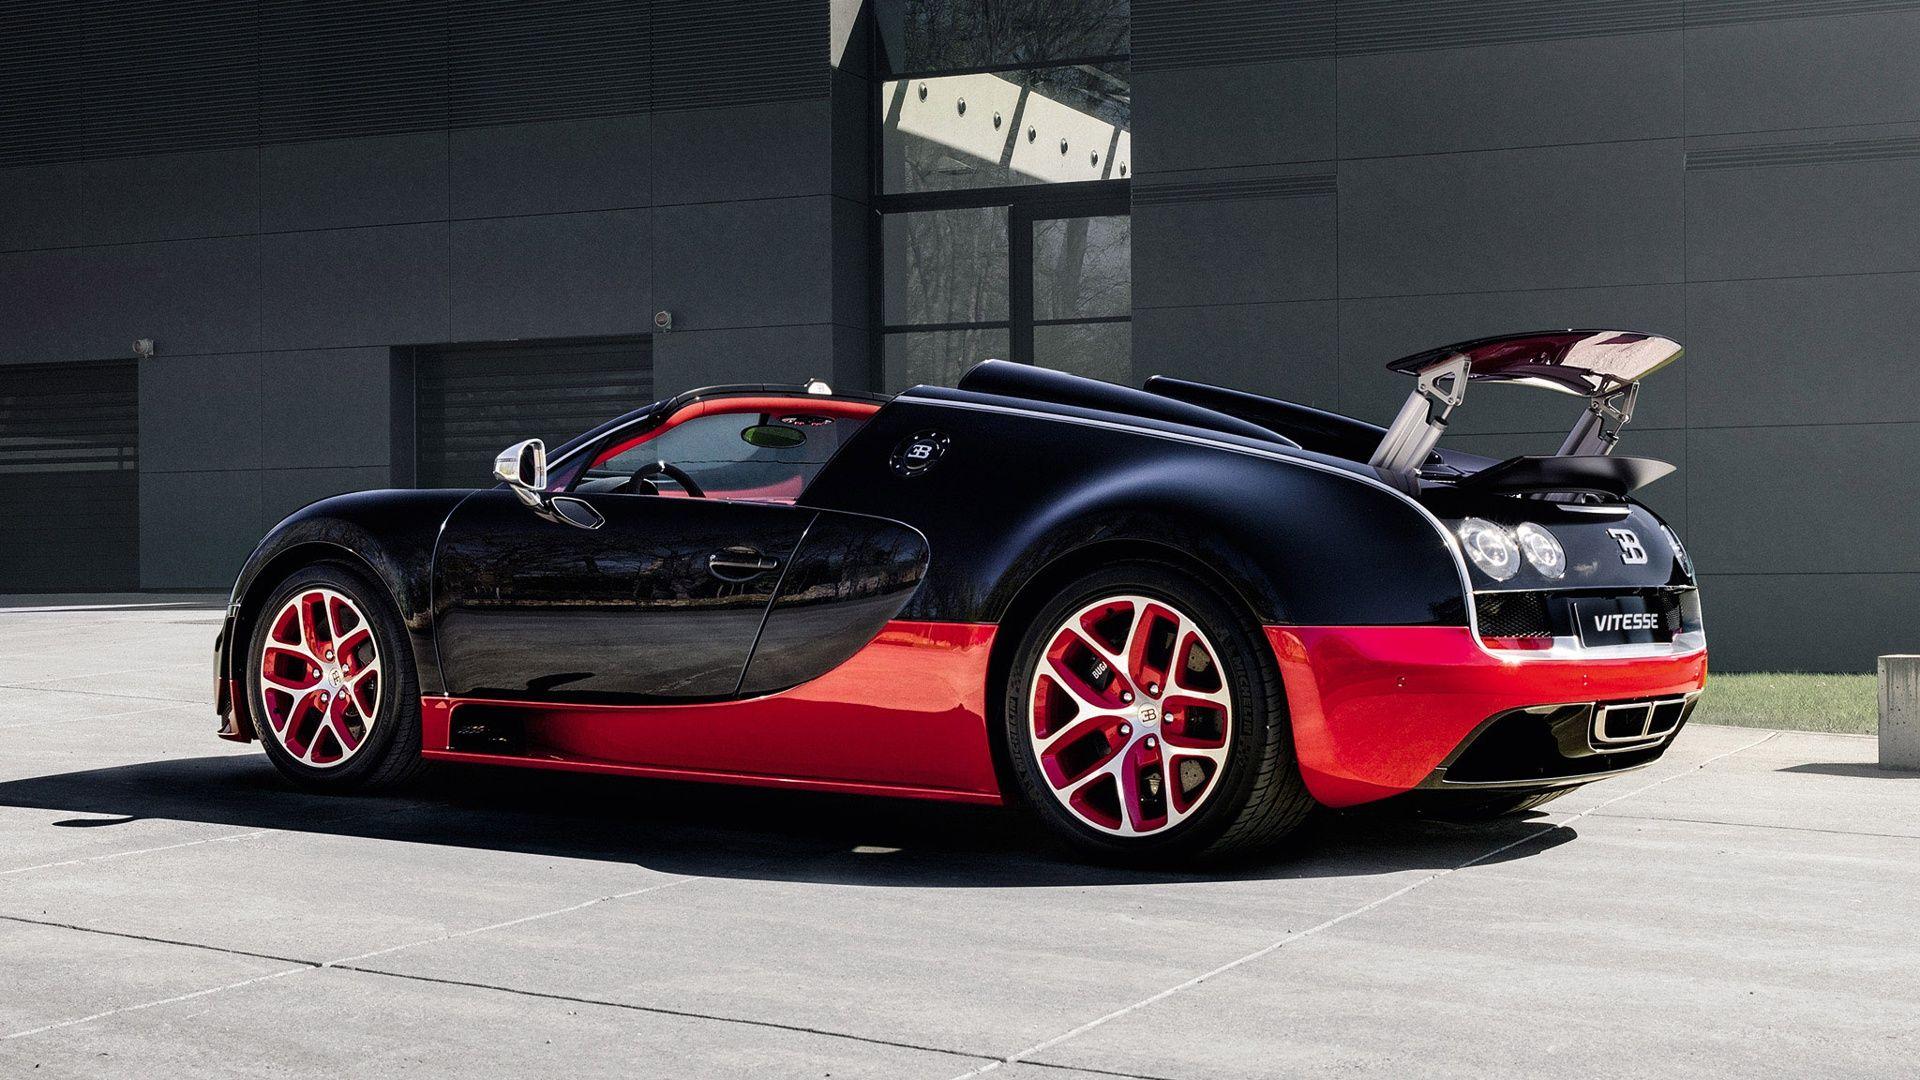 Pin By Karen Hay On Vroom Vroom Cars Bugatti Veyron Grand Sport Vitesse Bugatti Cars Bugatti Veyron